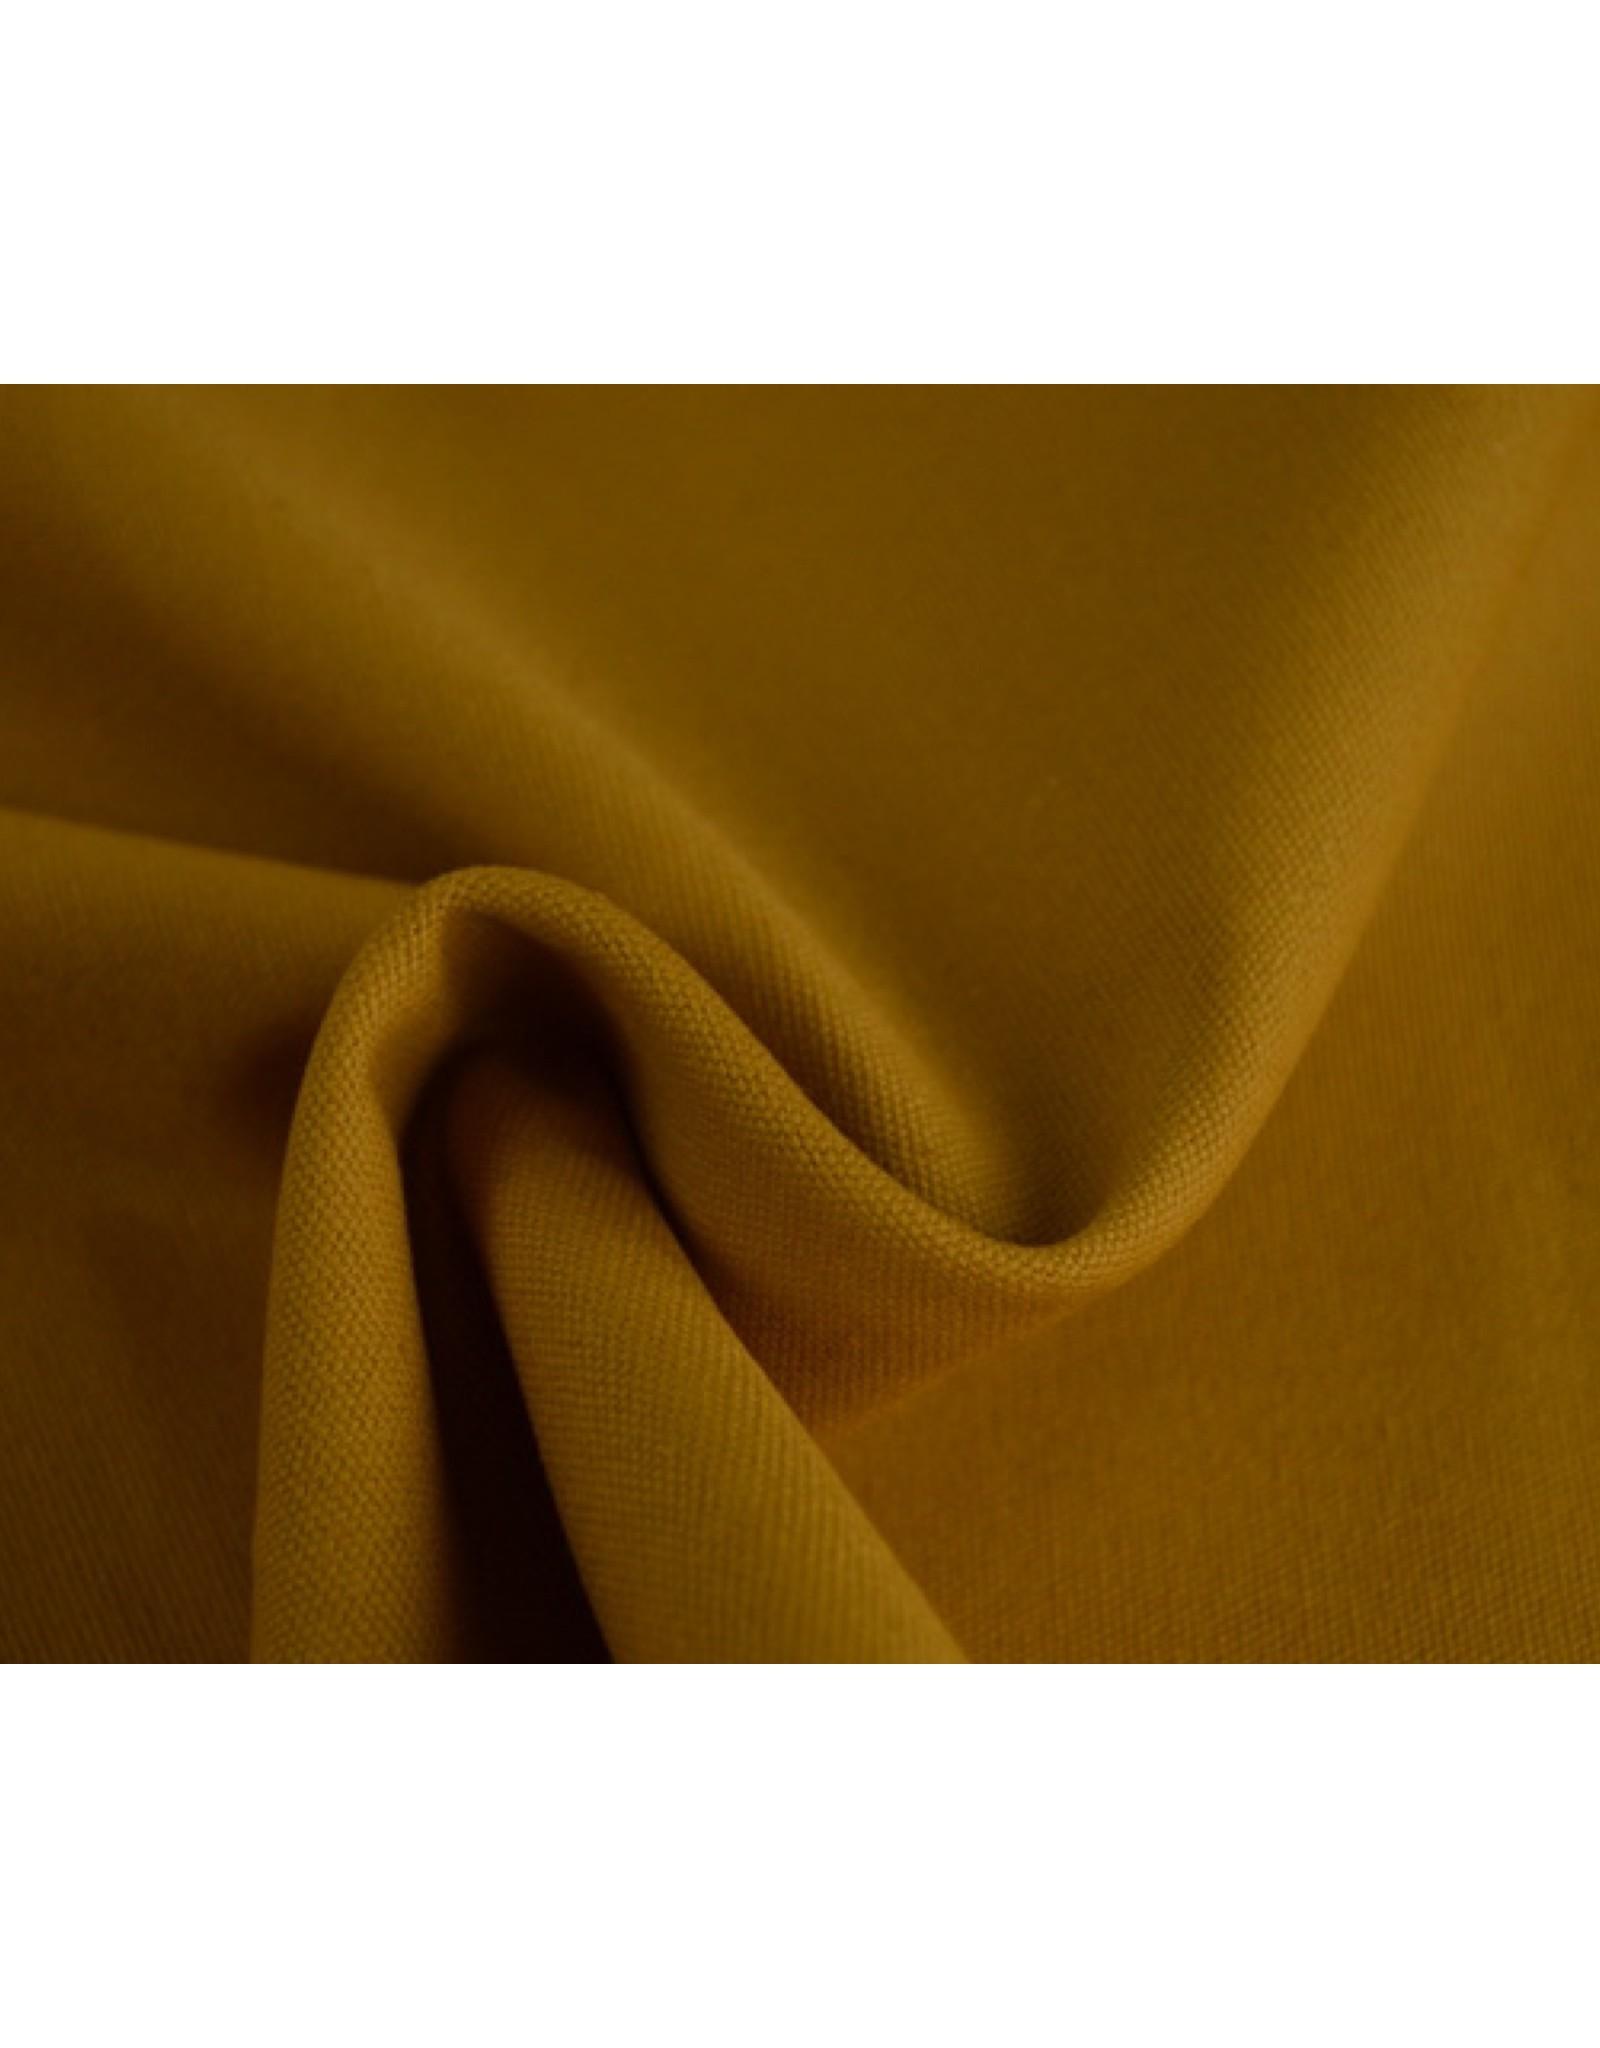 Kanvas stoff Uni - Ockergelb (350 gr/m)